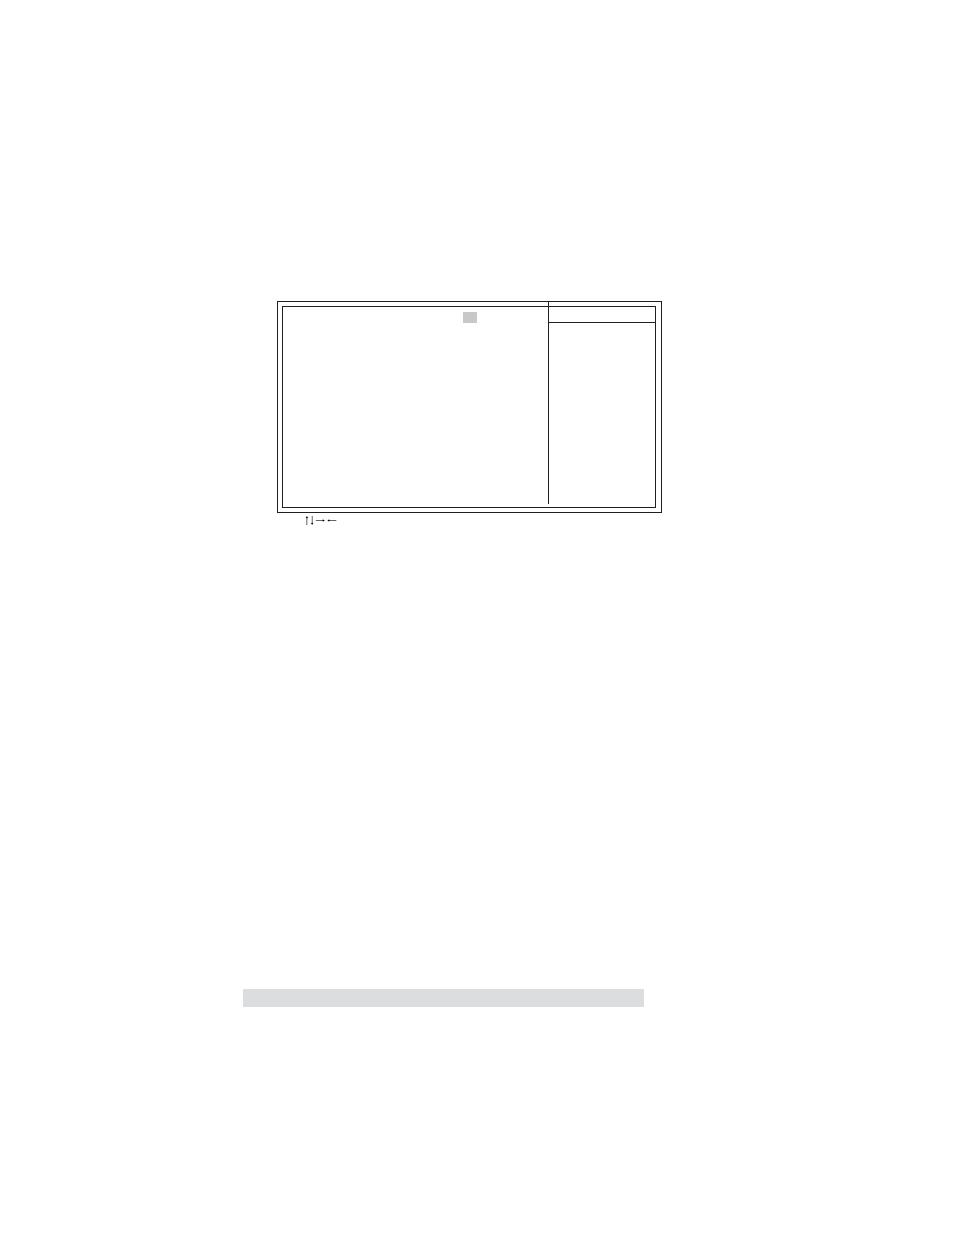 Using bios, Power management setup | Elitegroup MS110 (V1.0) User ...